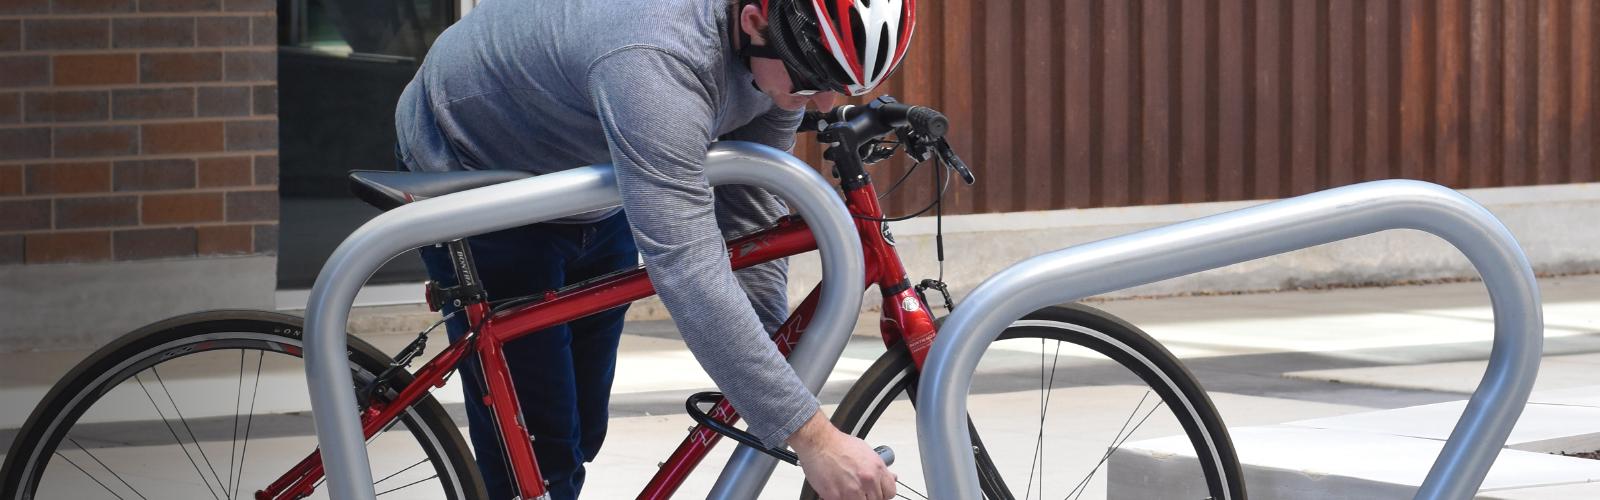 madrax bicycle parking